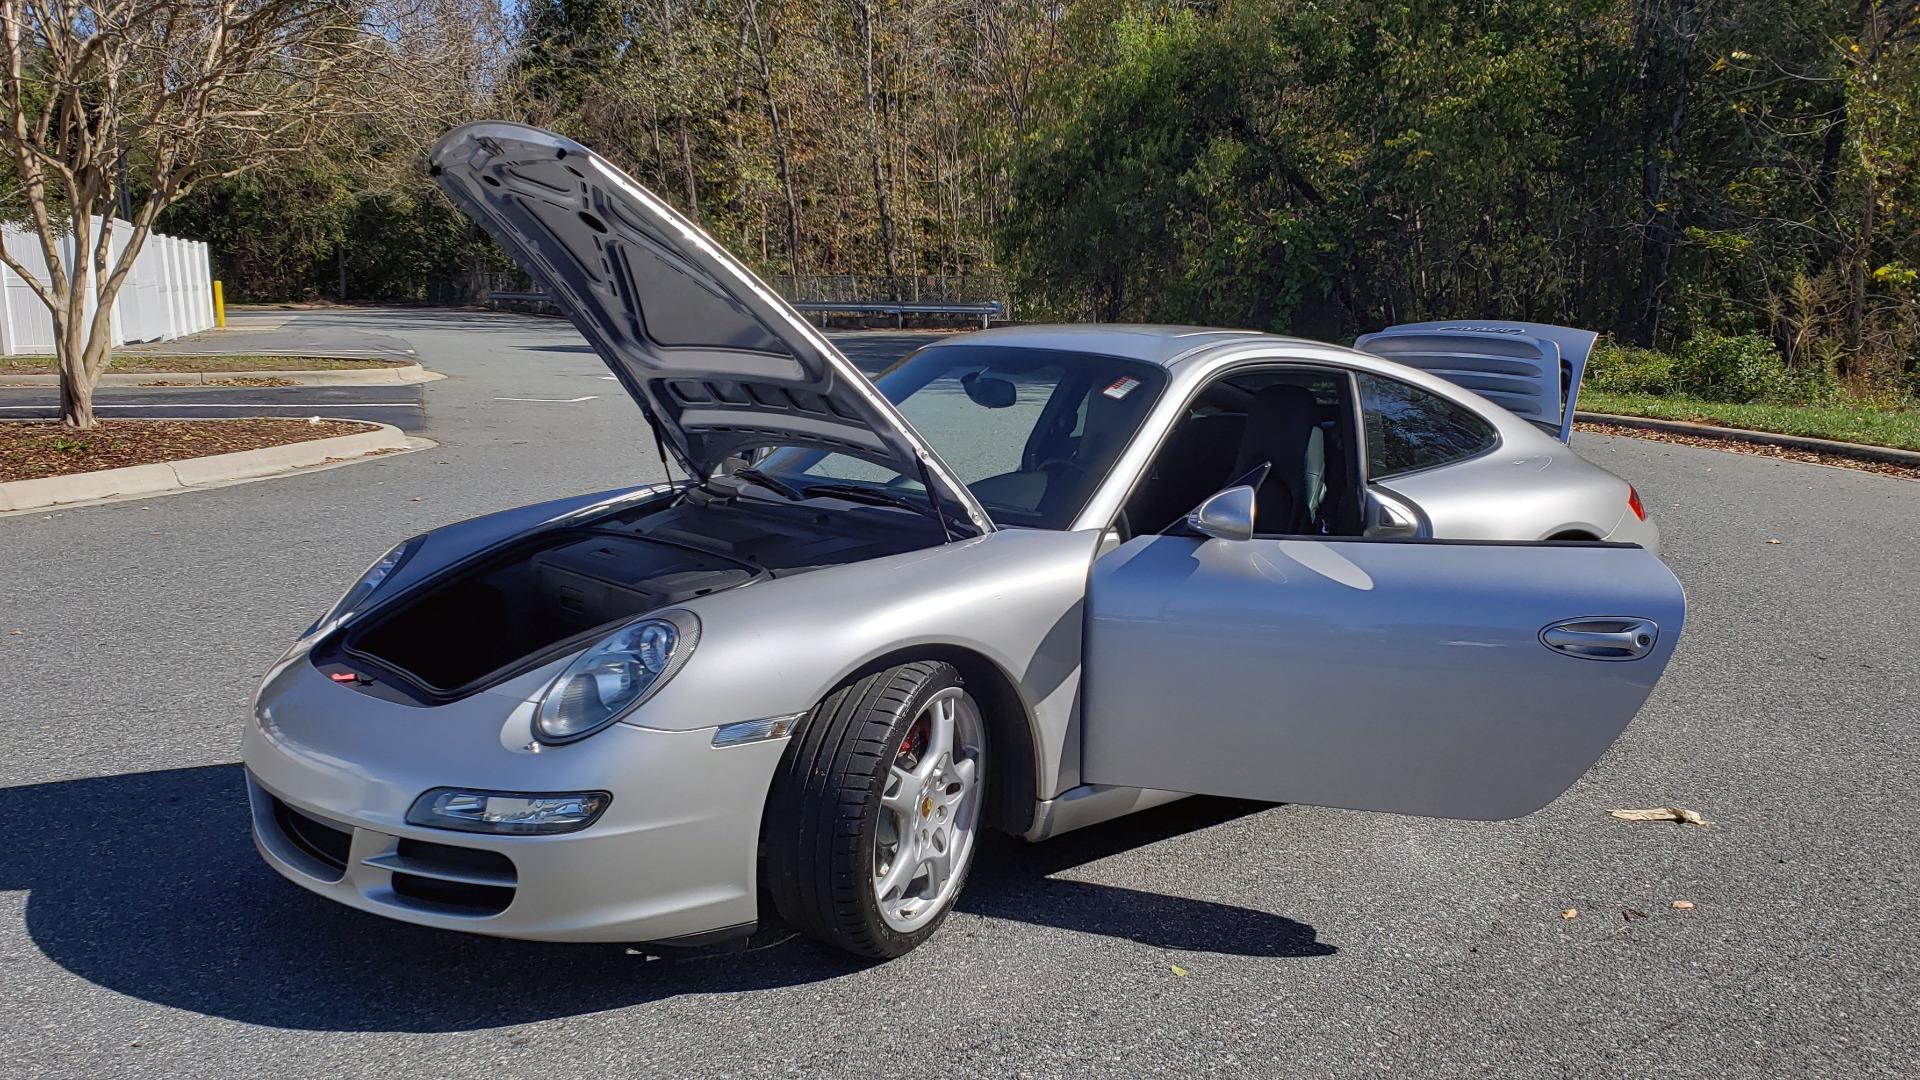 Used 2006 Porsche 911 CARRERA S / 5-SPD AUTO / SPORT CHRONO / NAV / BOSE / SUNROOF for sale Sold at Formula Imports in Charlotte NC 28227 72